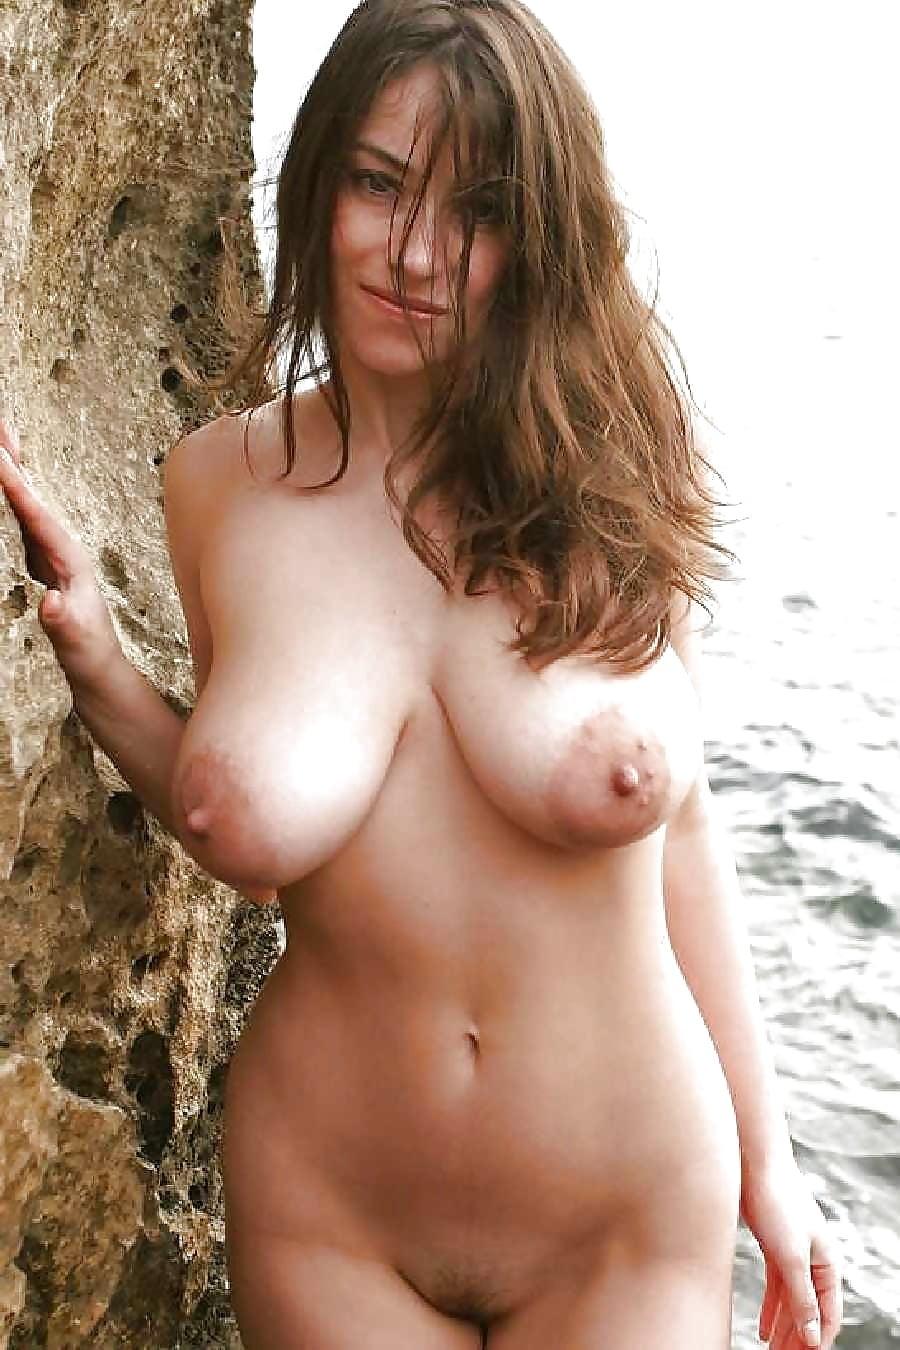 Amateur Natural Nude Mature Battalion Free Pics